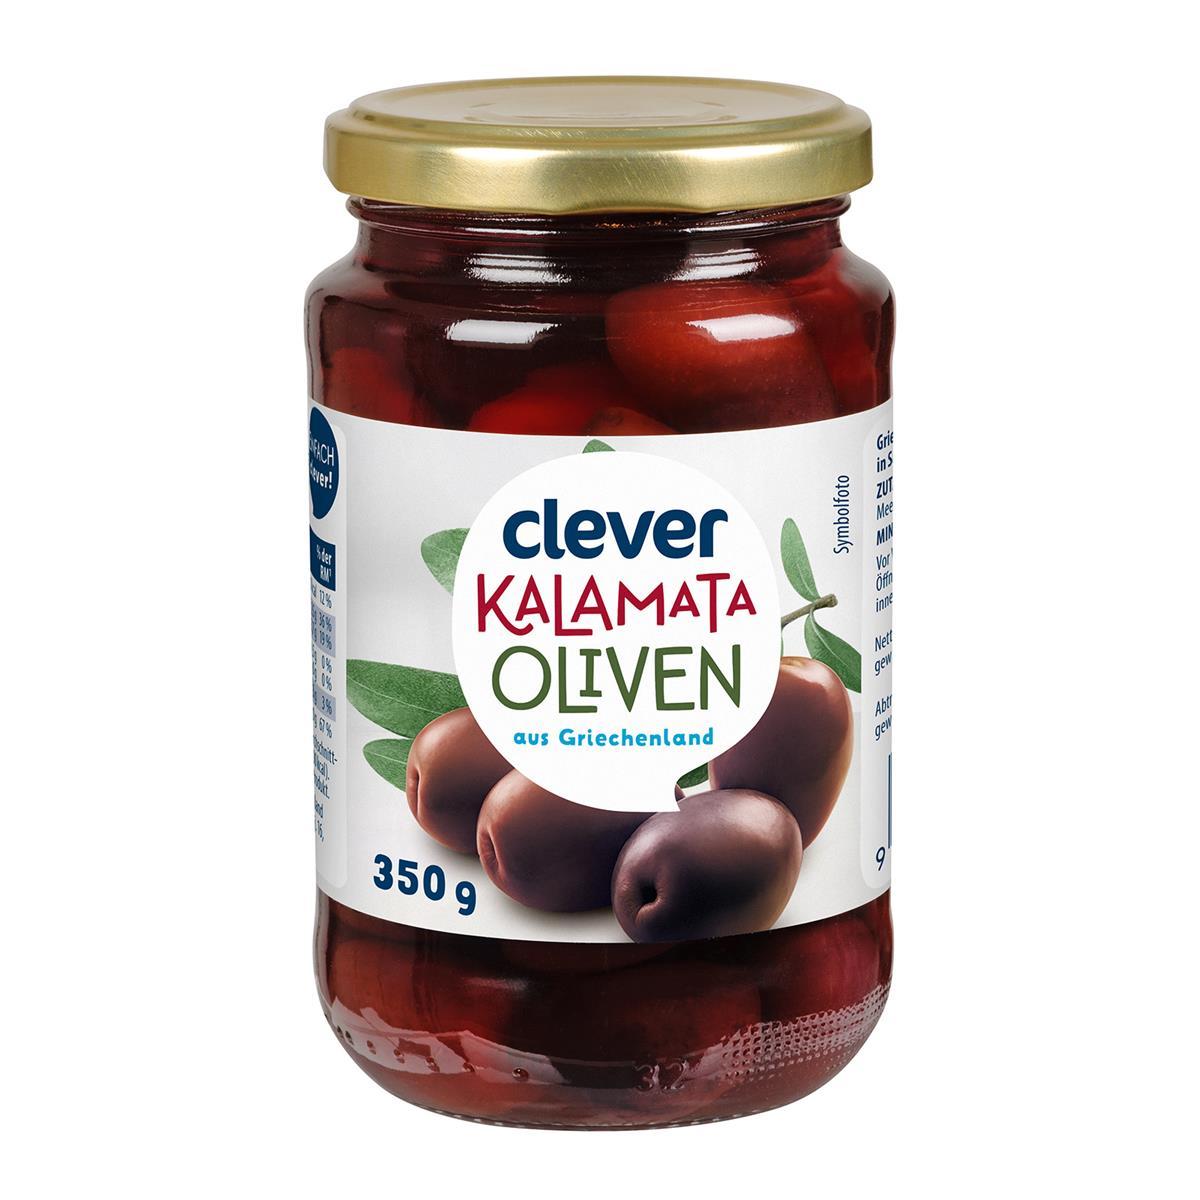 Clever Kalamata Oliven online bestellen | BILLA